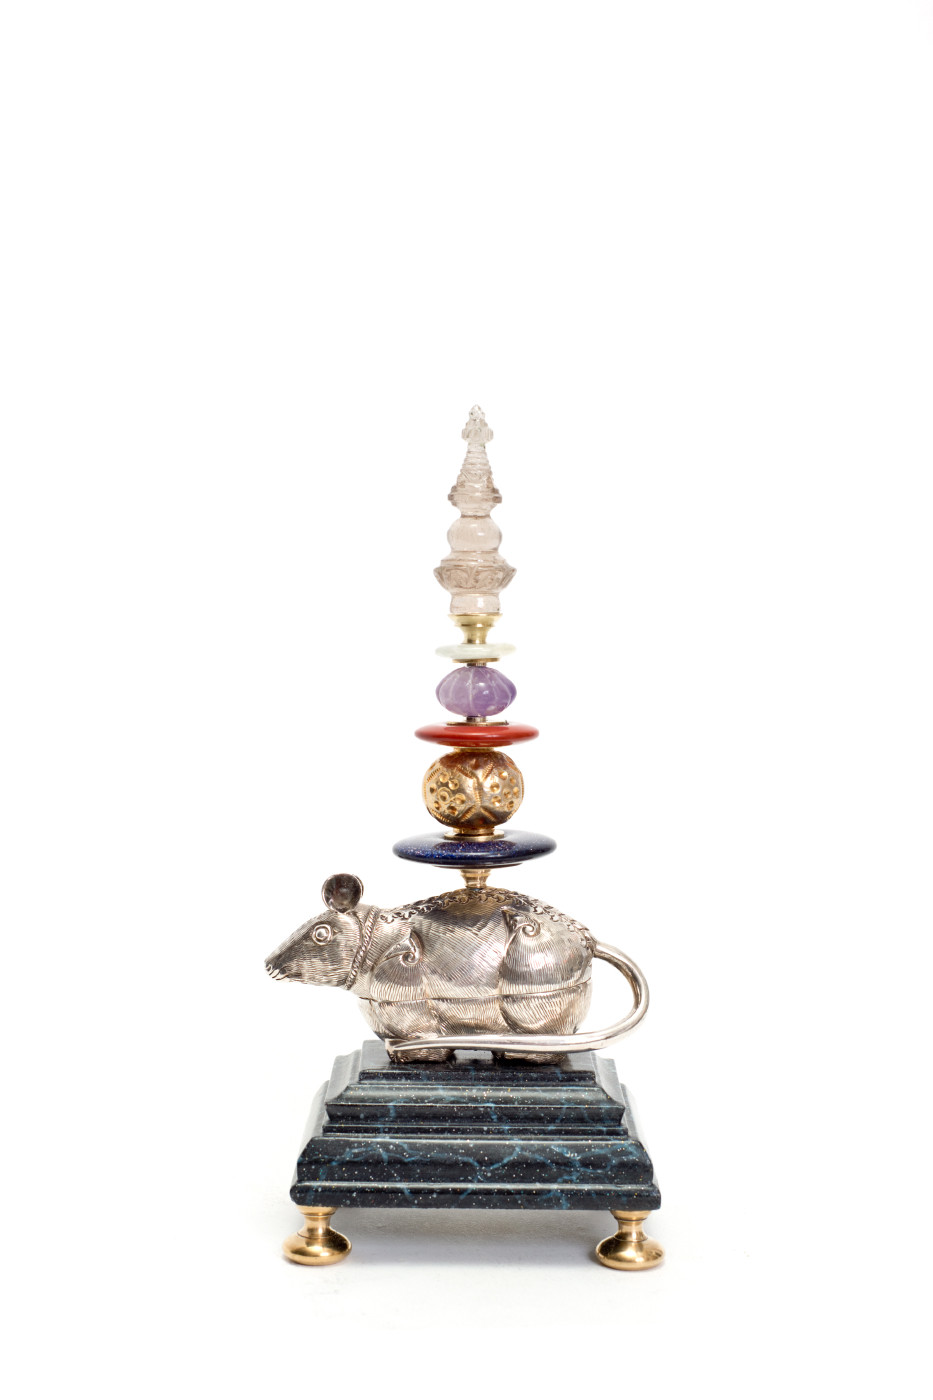 Klaus Dupont Maus  o.J. Tibetisches Silbergefäß, ziselierte Gold-, geschliffene Amethystperle, Bergkristallpagode